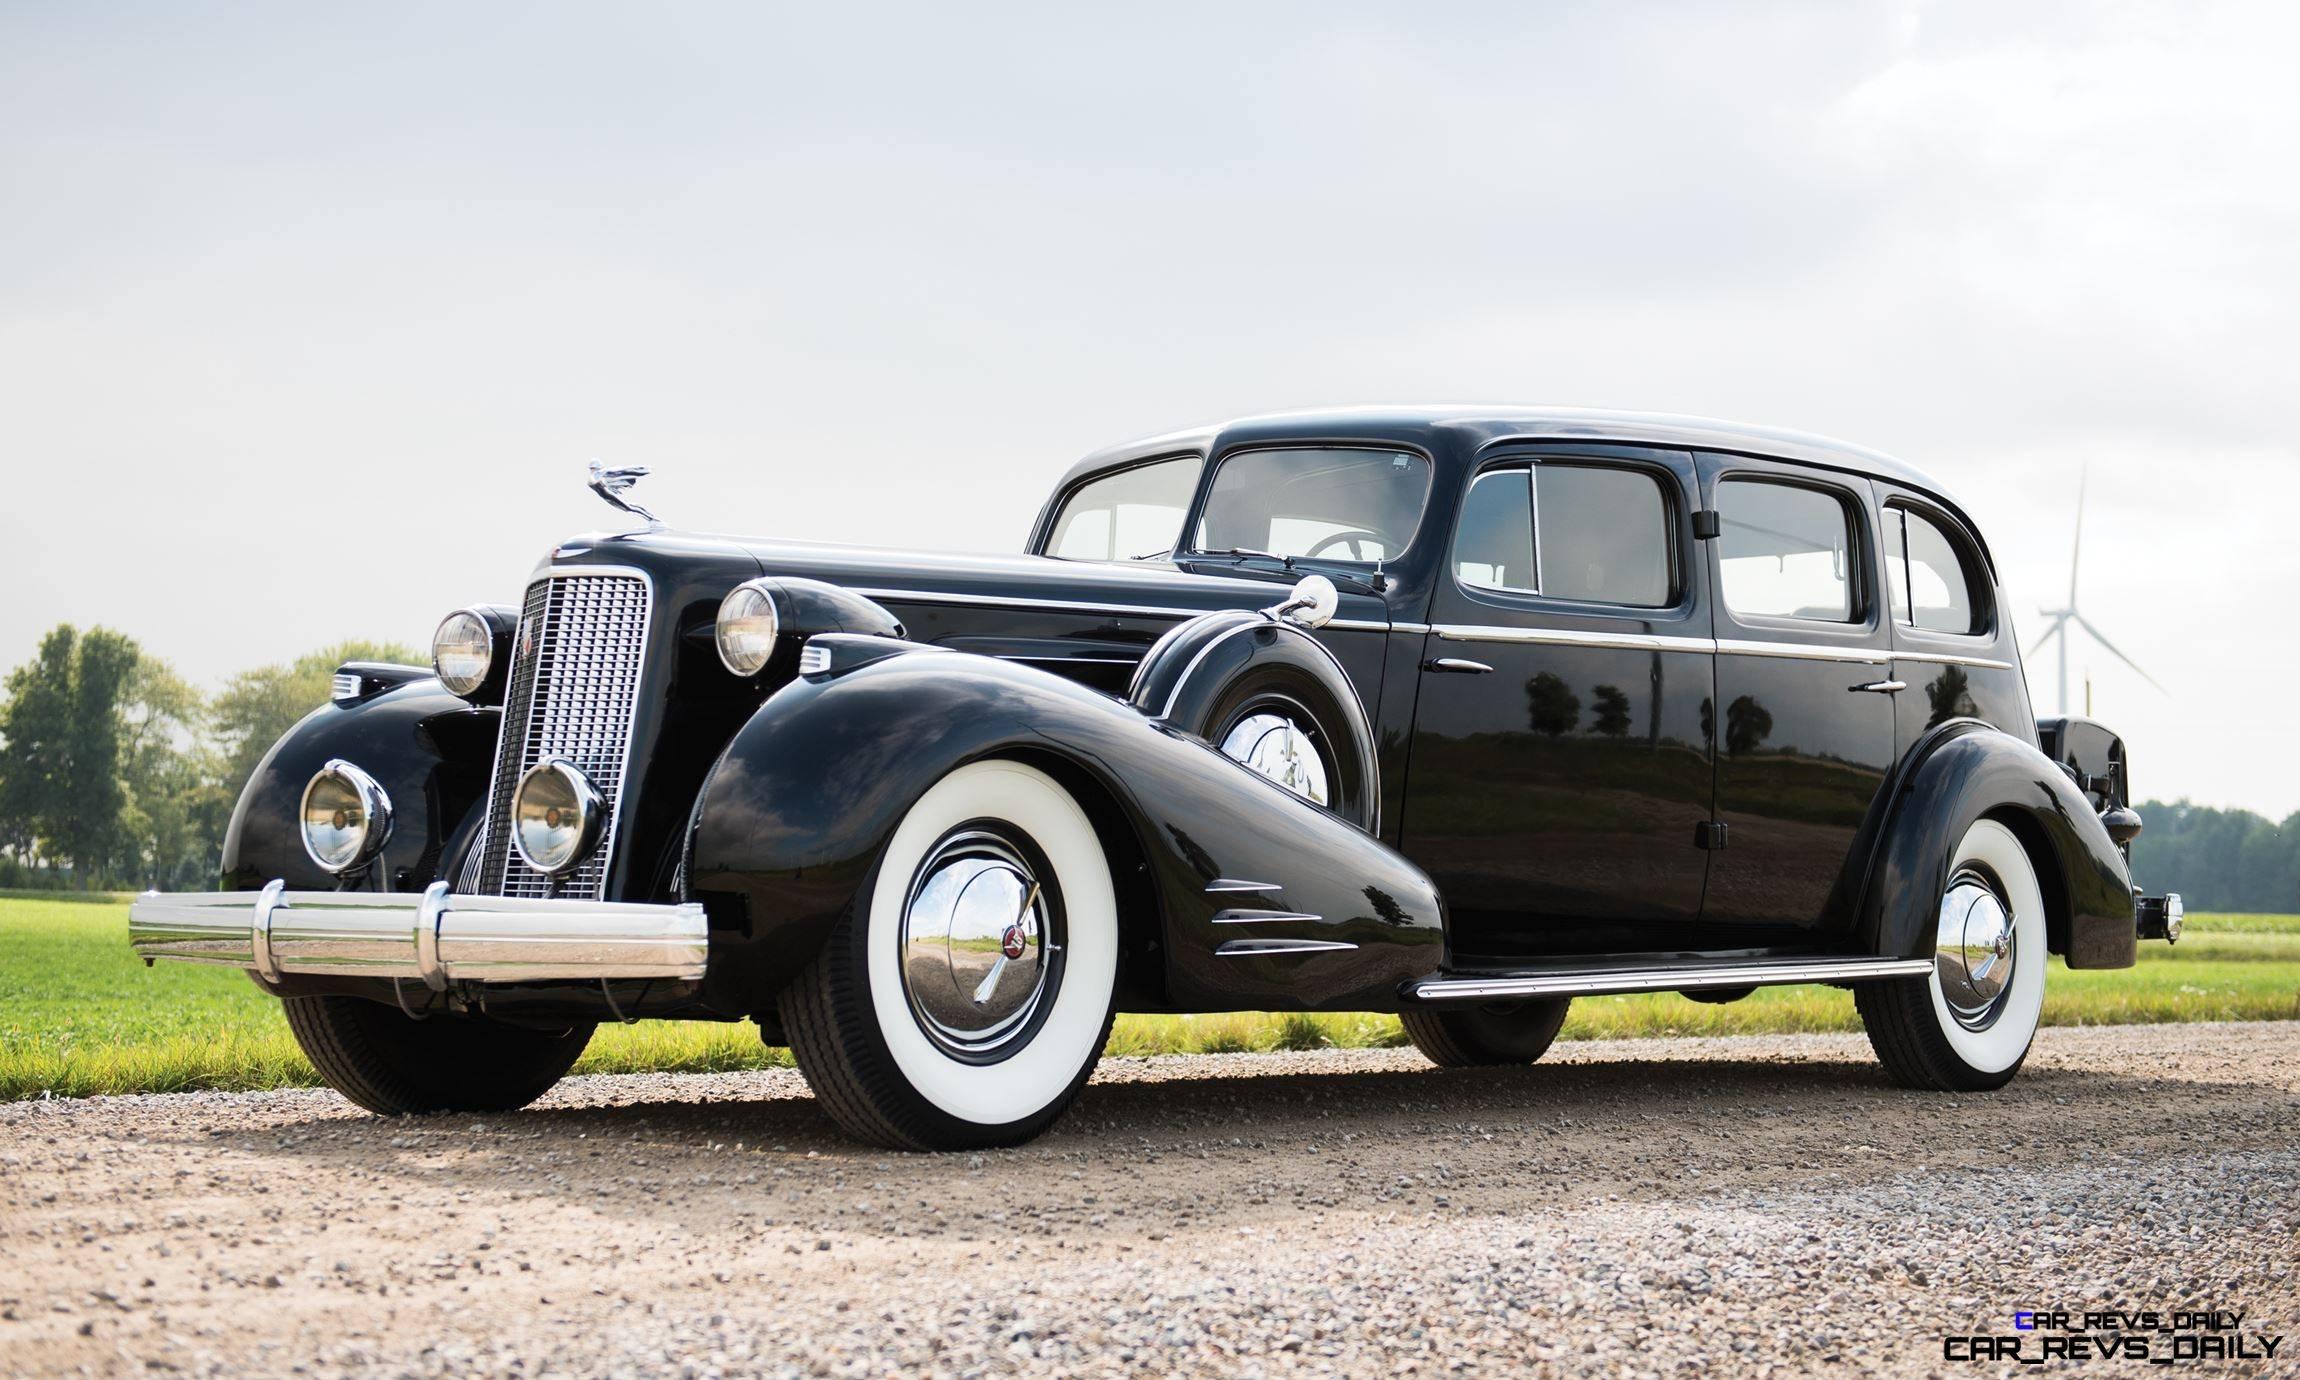 1937 Cadillac V16 Fleetwood Limousine 1